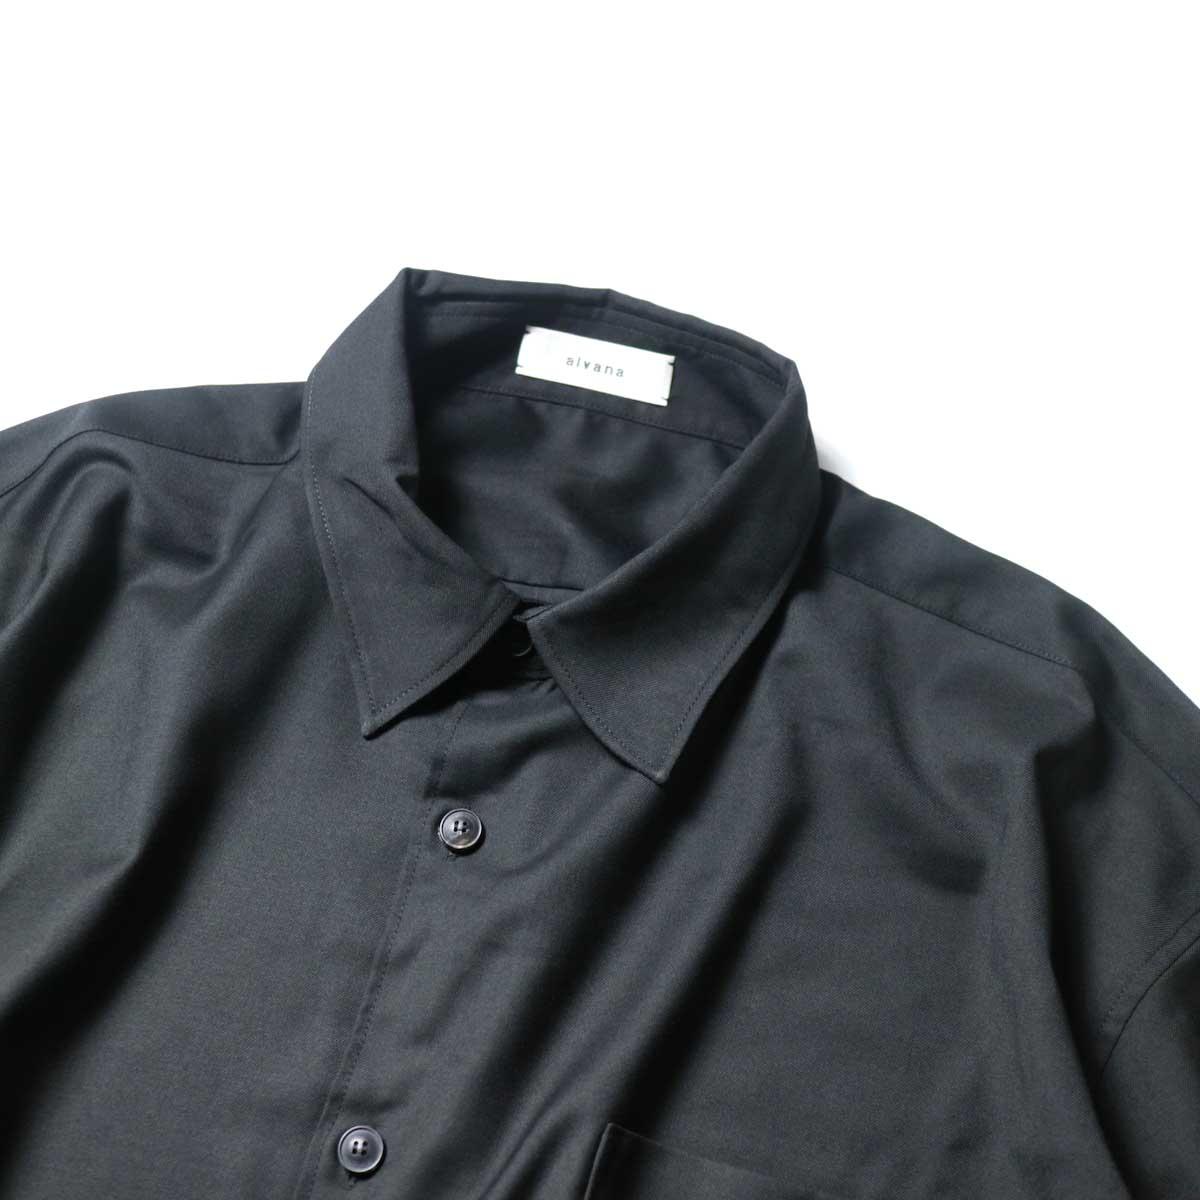 alvana / Wrinkle Proof Wide Shirts (Black)首周り